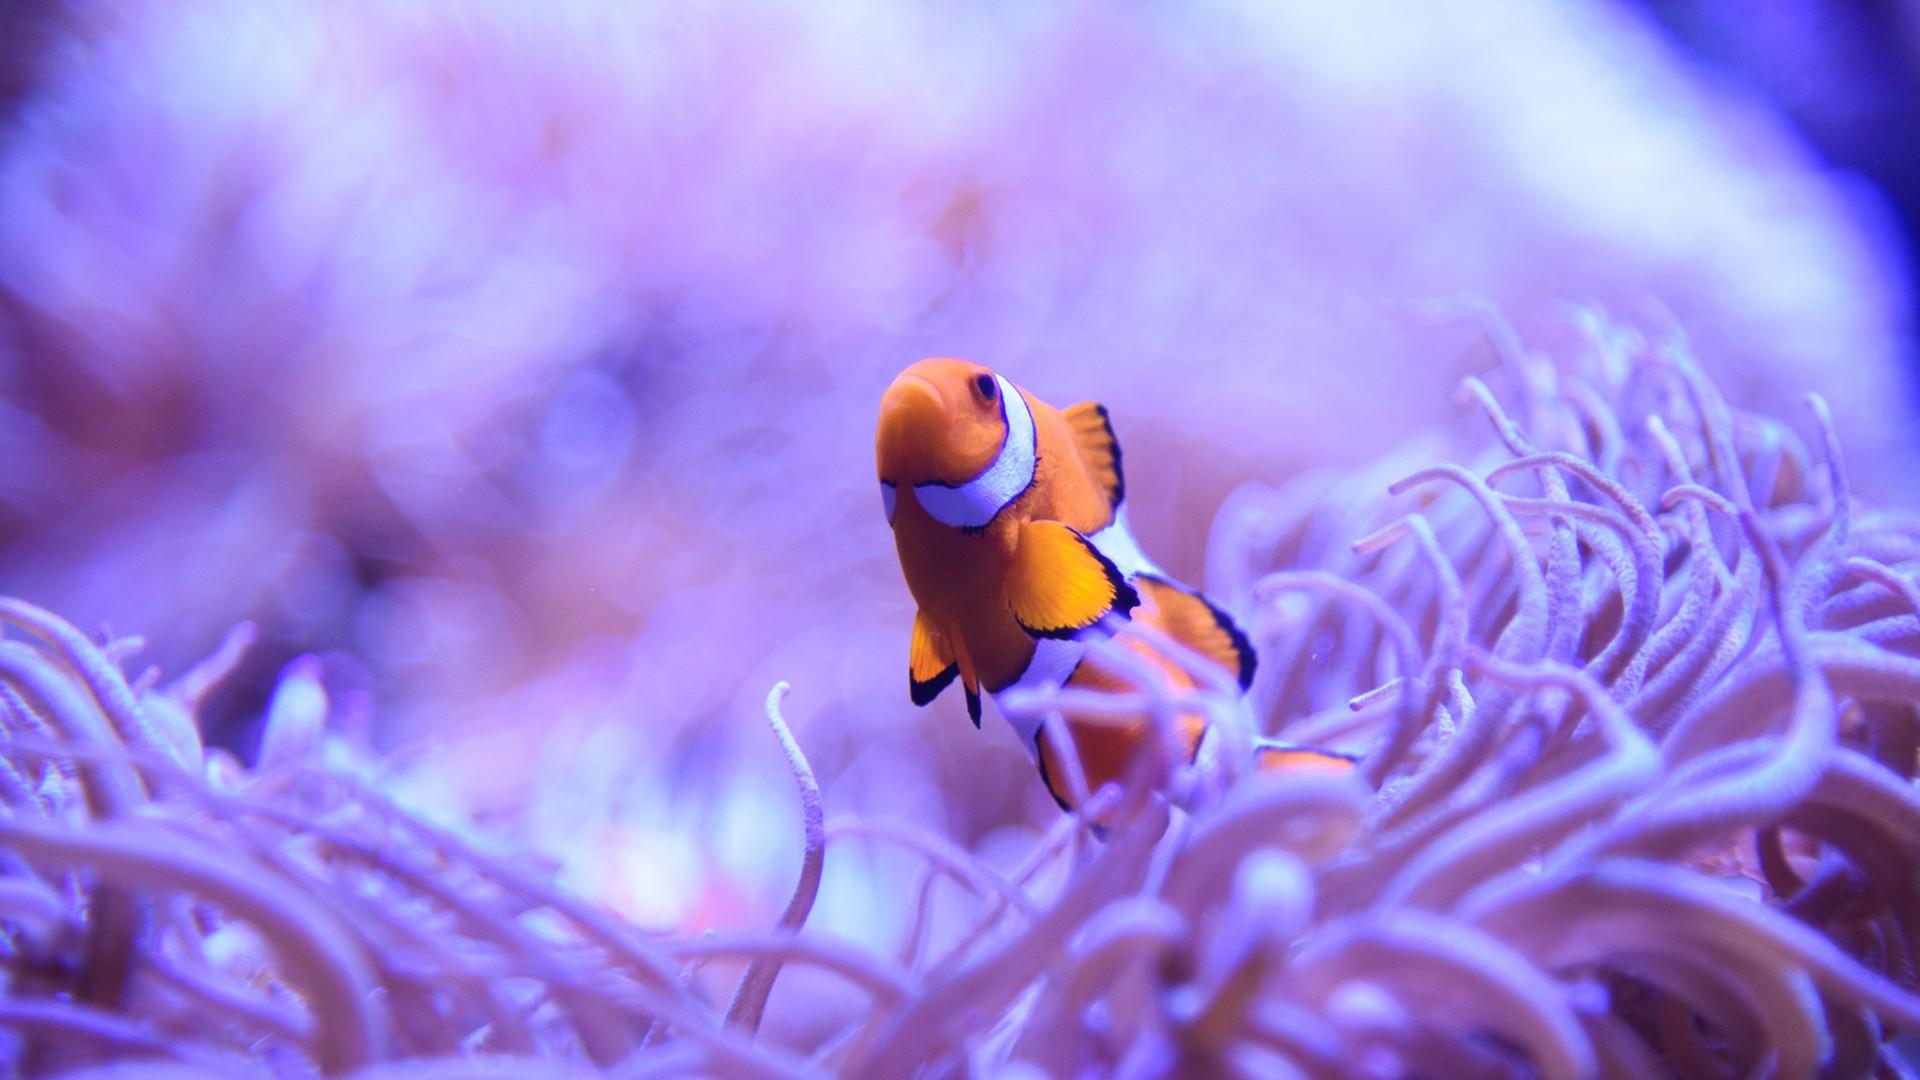 Hintergrundbilder Tiere Natur Fotografie Lila Makro